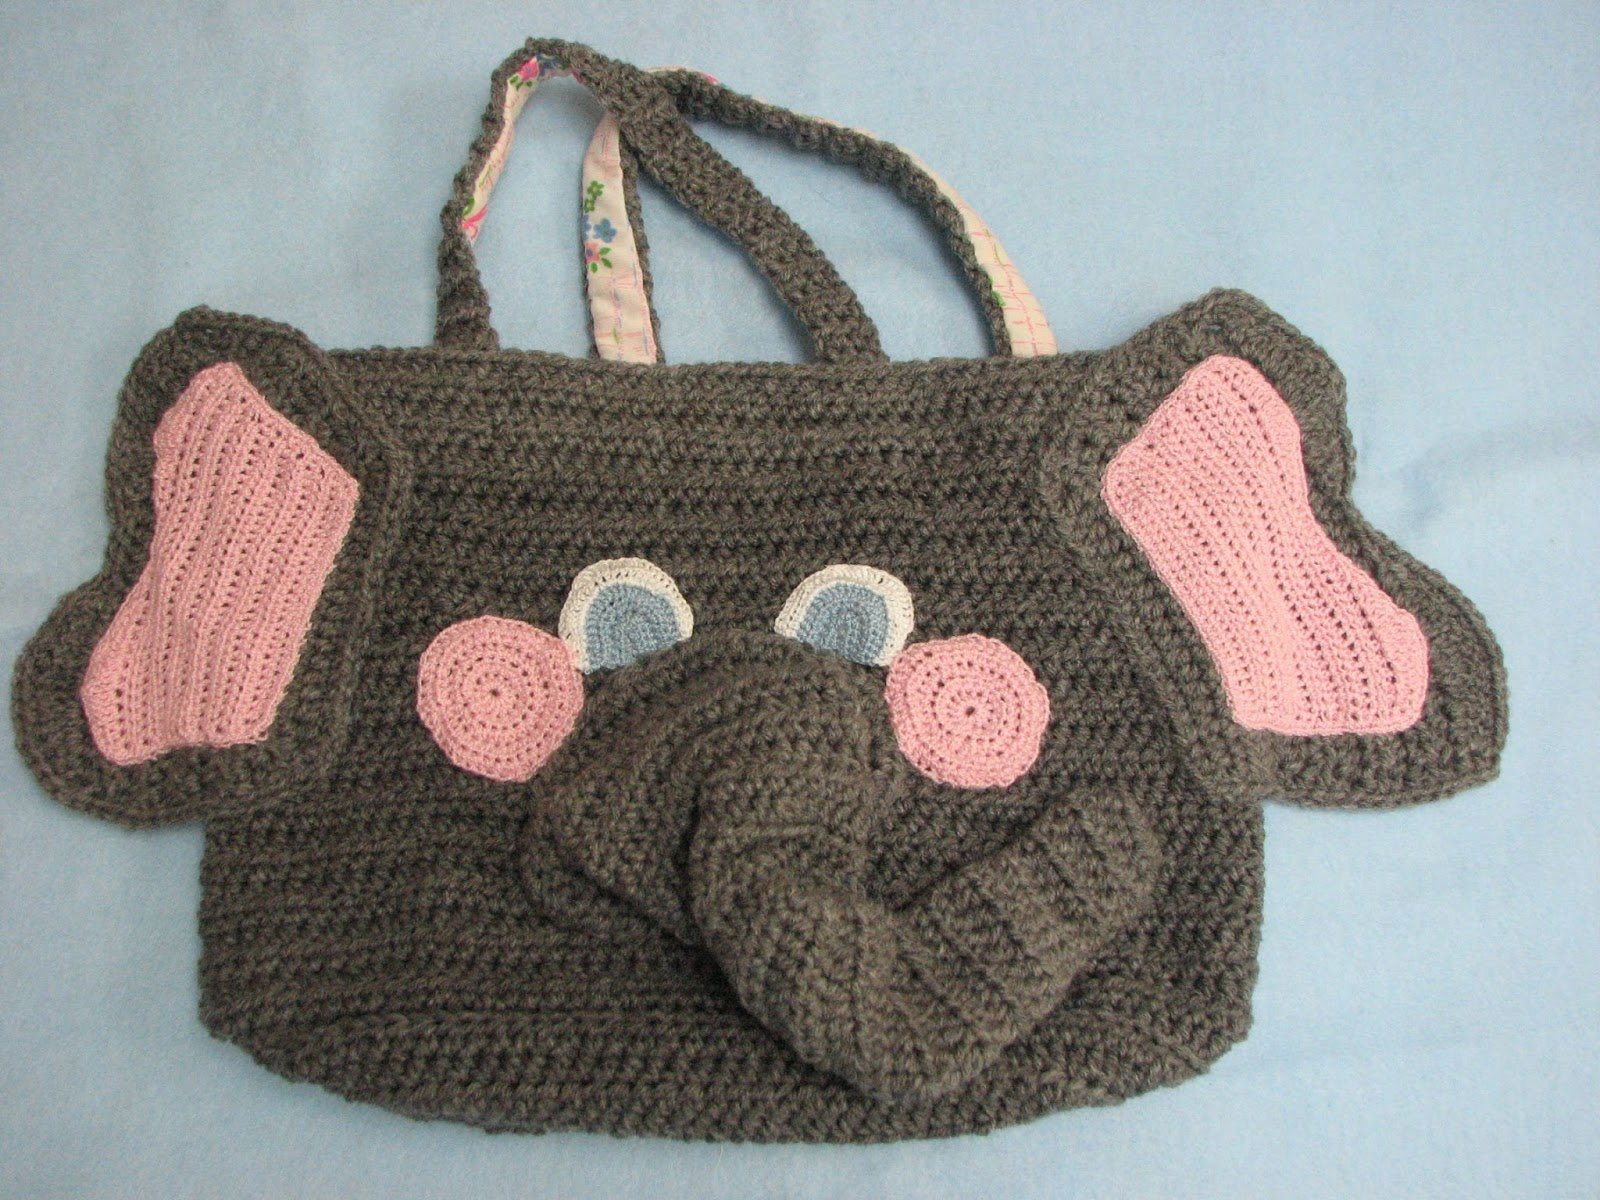 Free crochet elephant backpack pattern dancox for donnas crochet designs blog of free patterns elephant dt1010fo